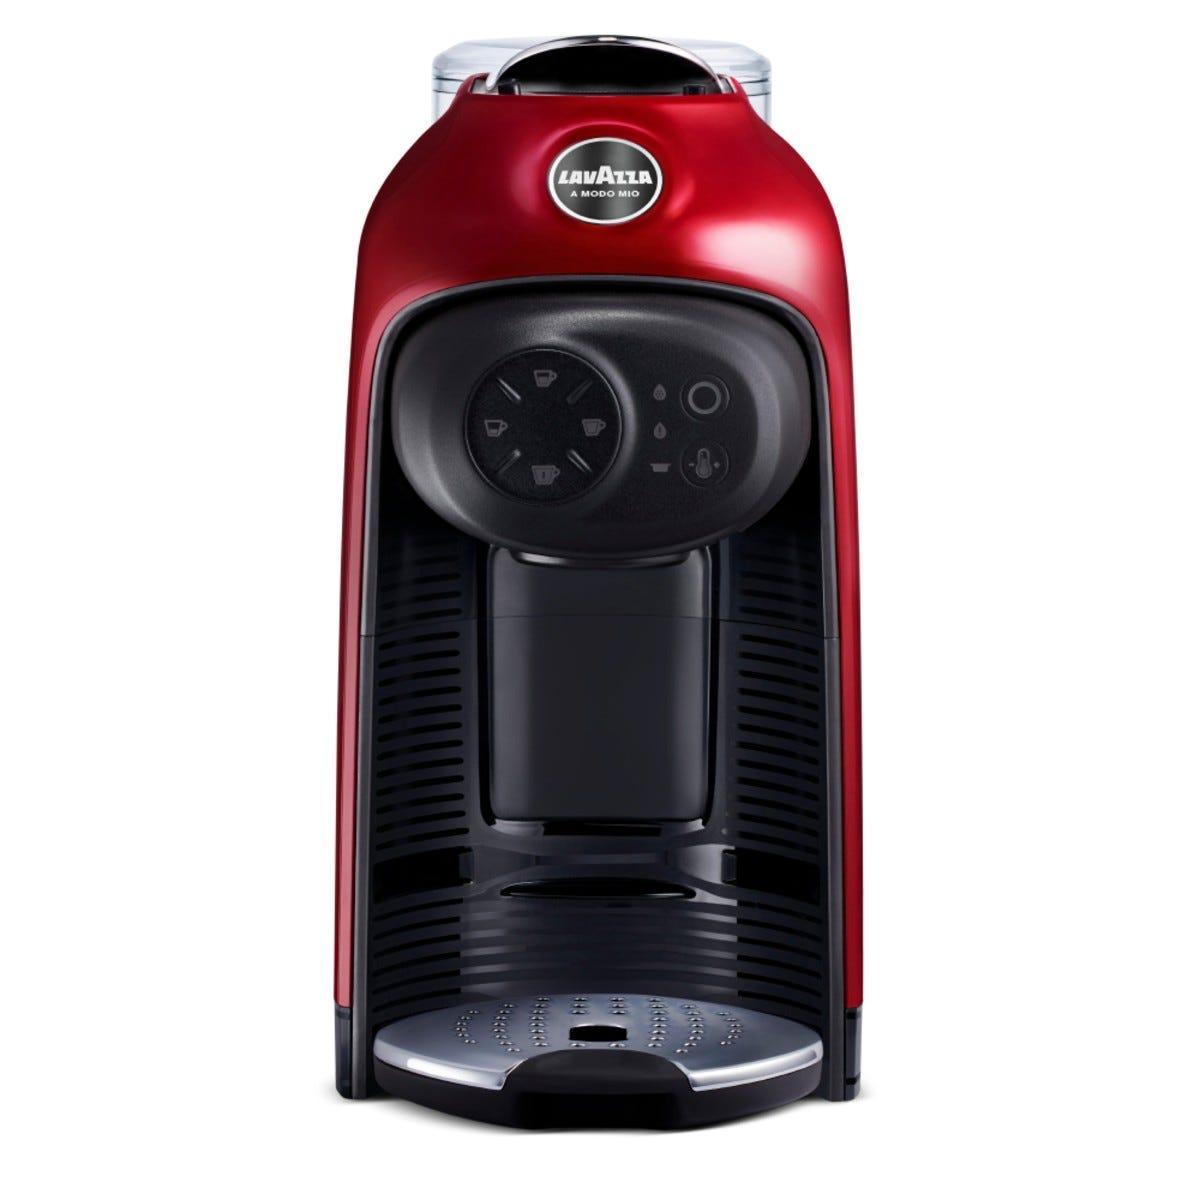 Lavazza 18000281 Idola Coffee Machine - Red